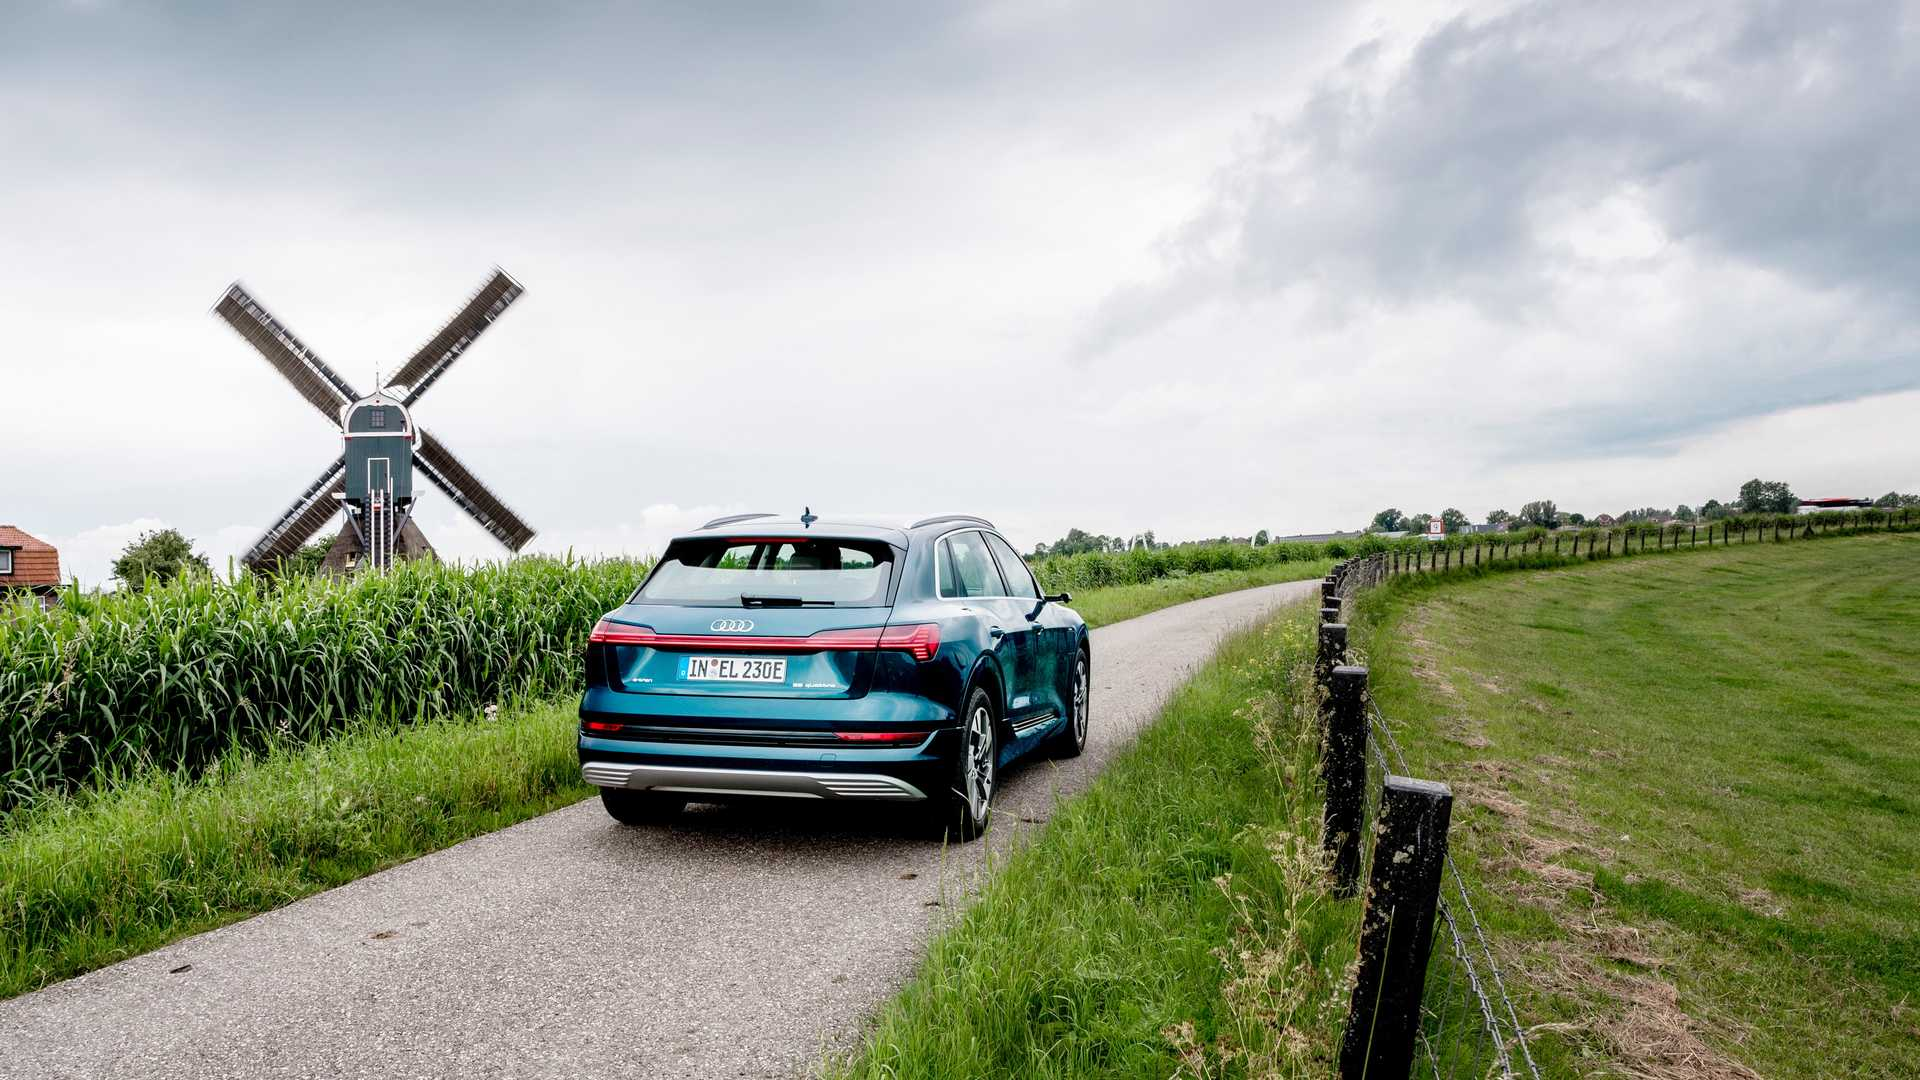 Кроссовер Audi e-tron пересек 10 границ за сутки 2